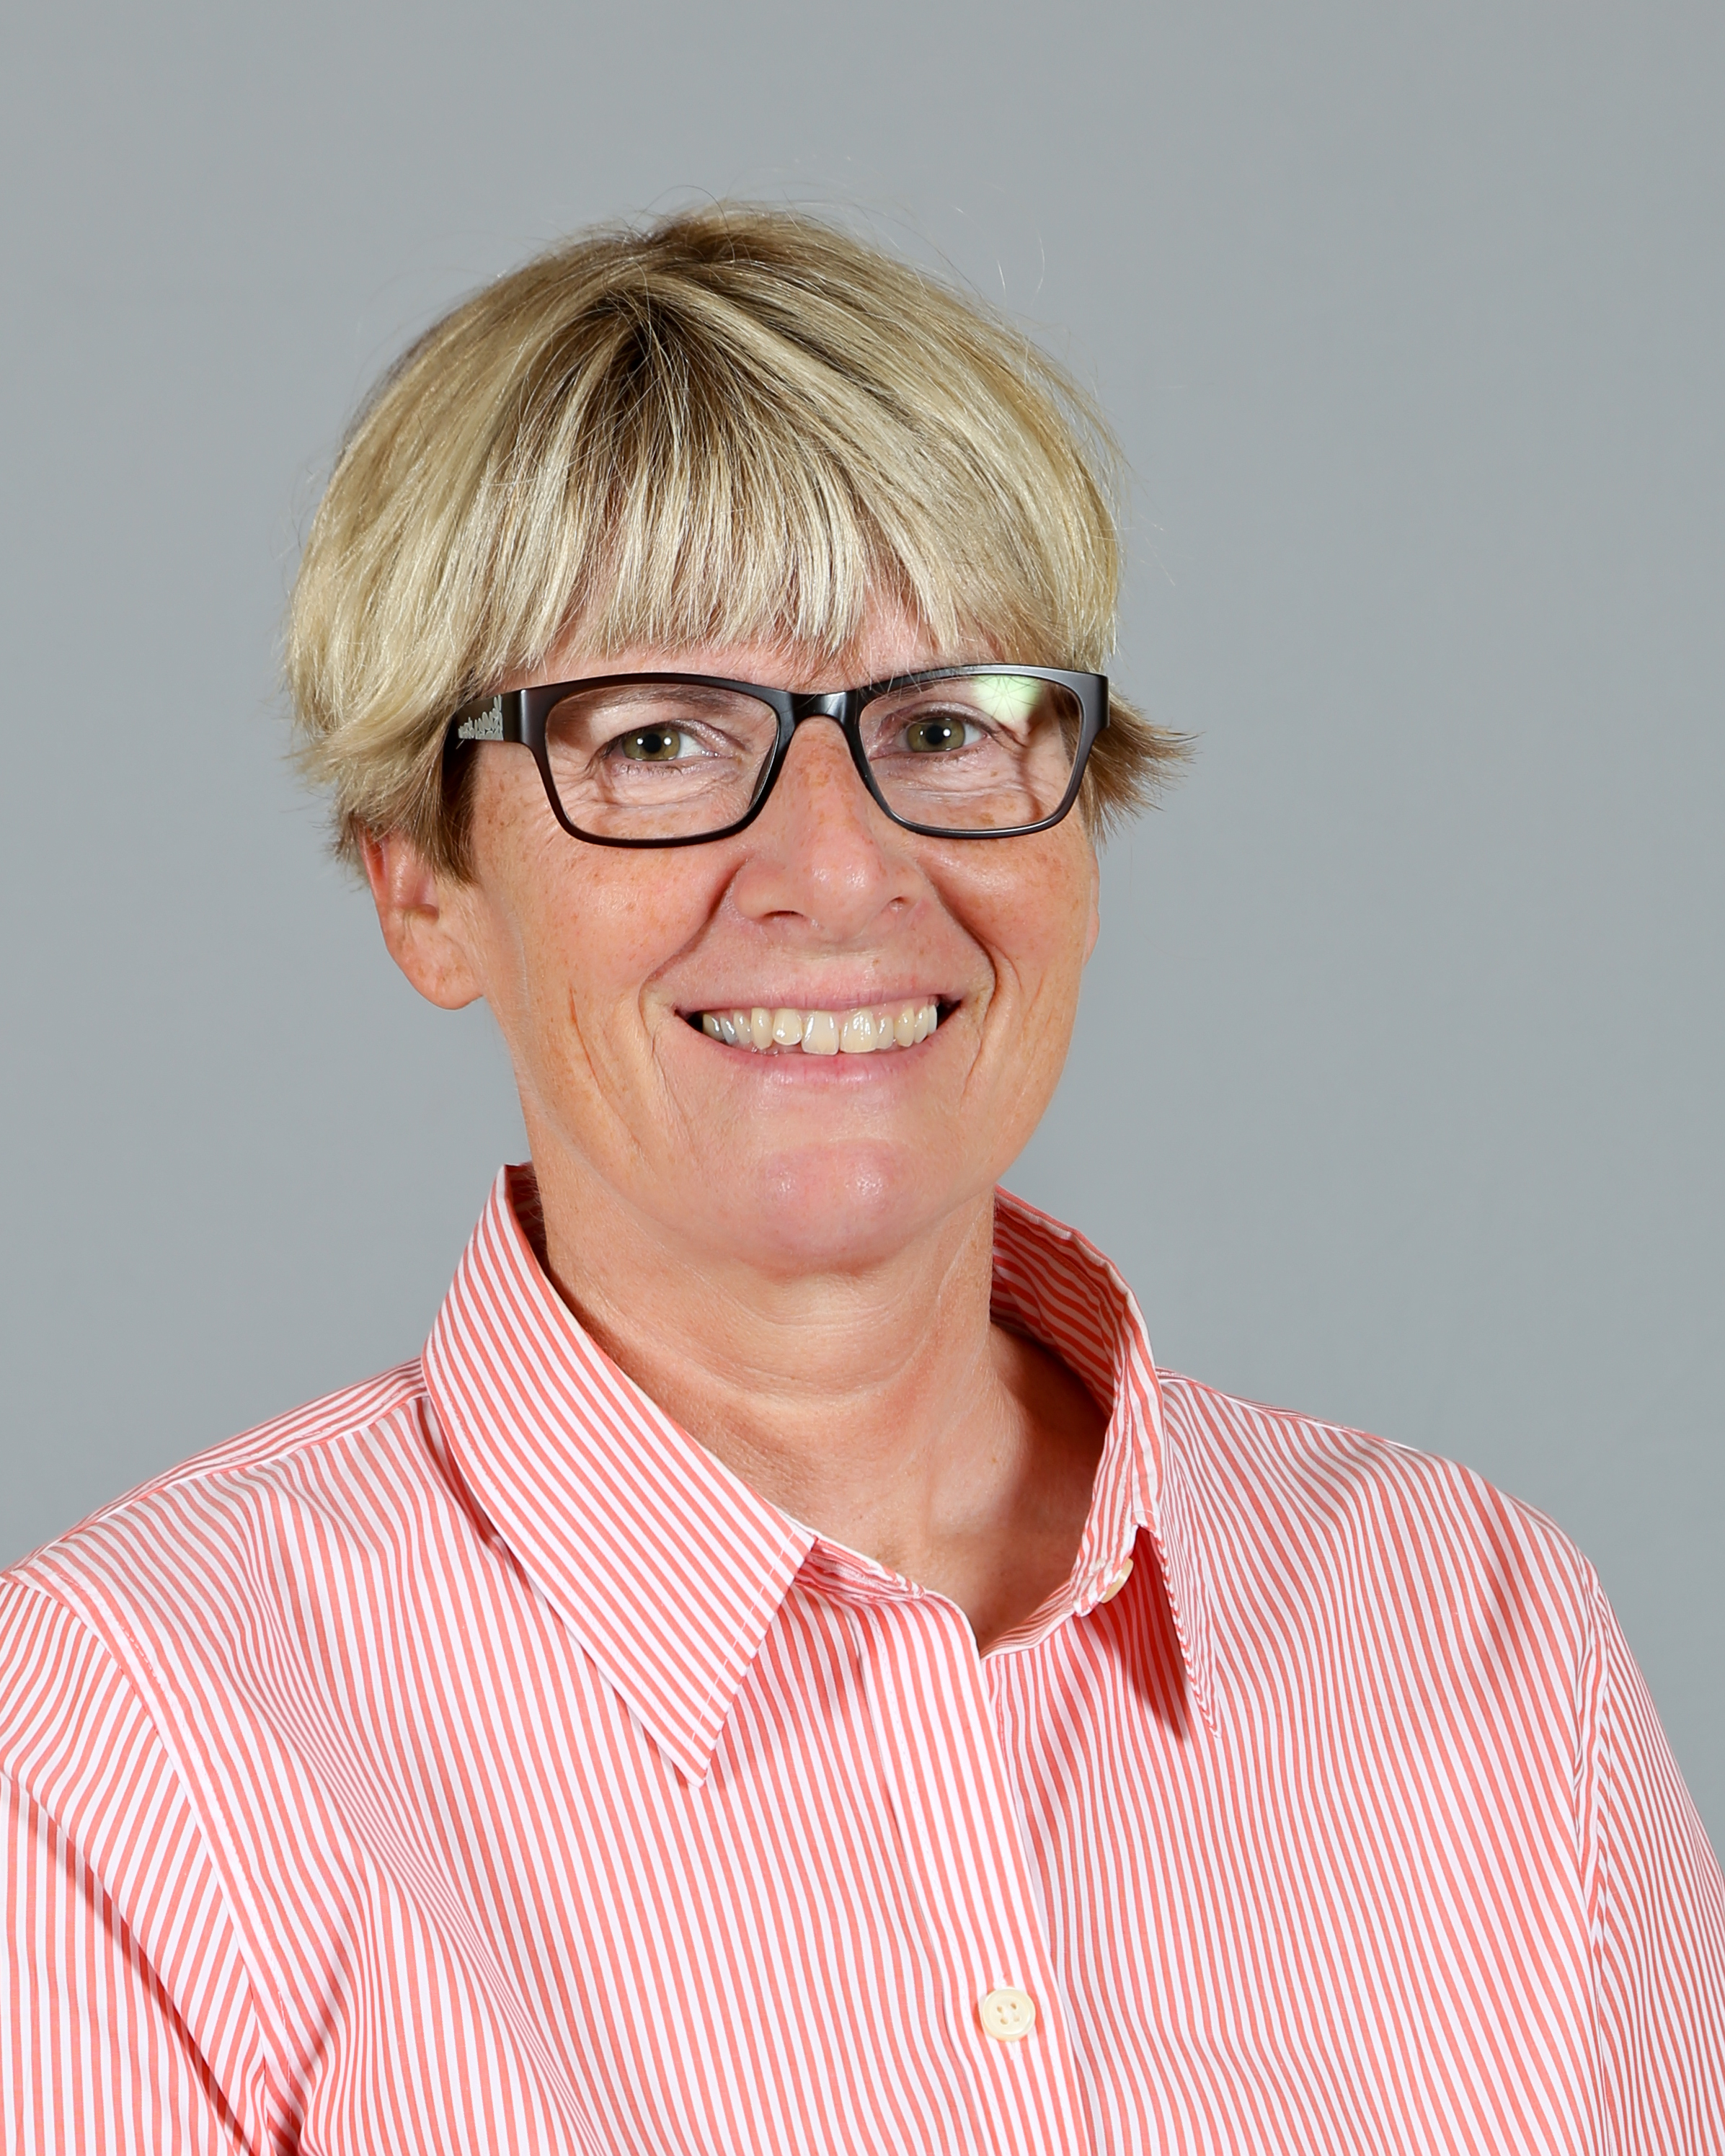 Lauree Gott Portrait Photo